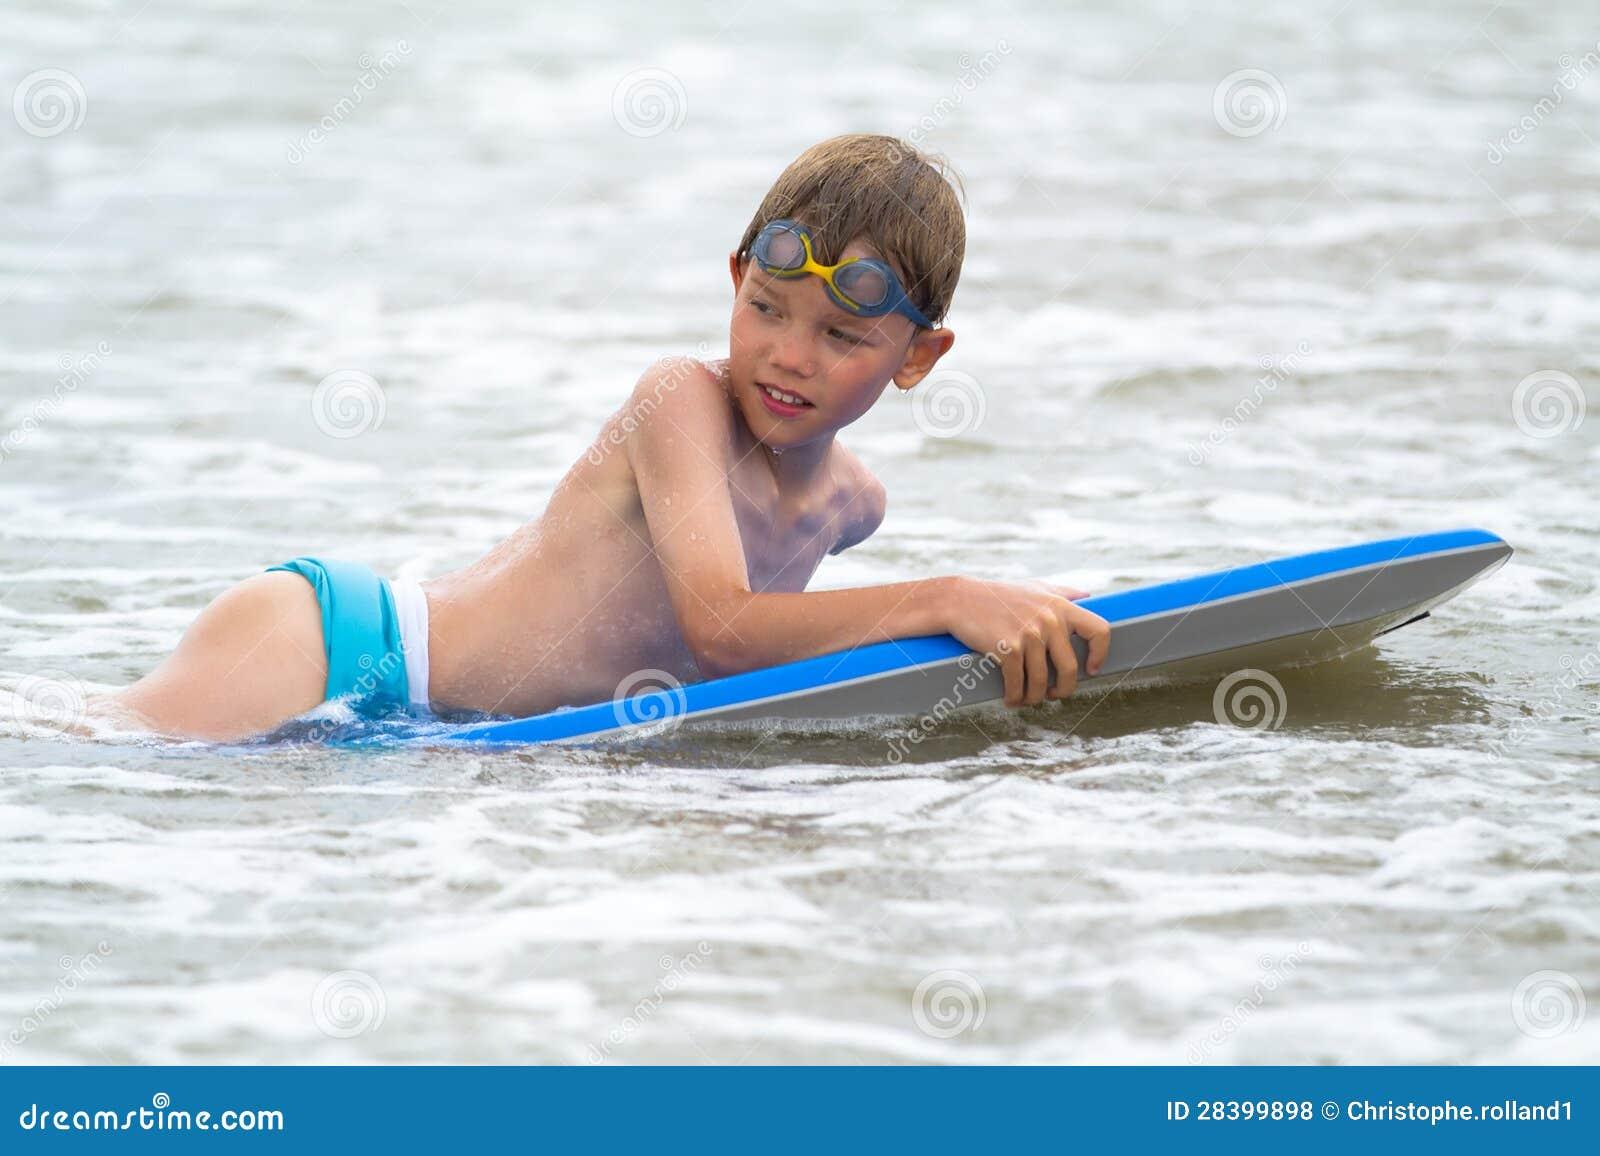 Школьники мальчики на пляже фото